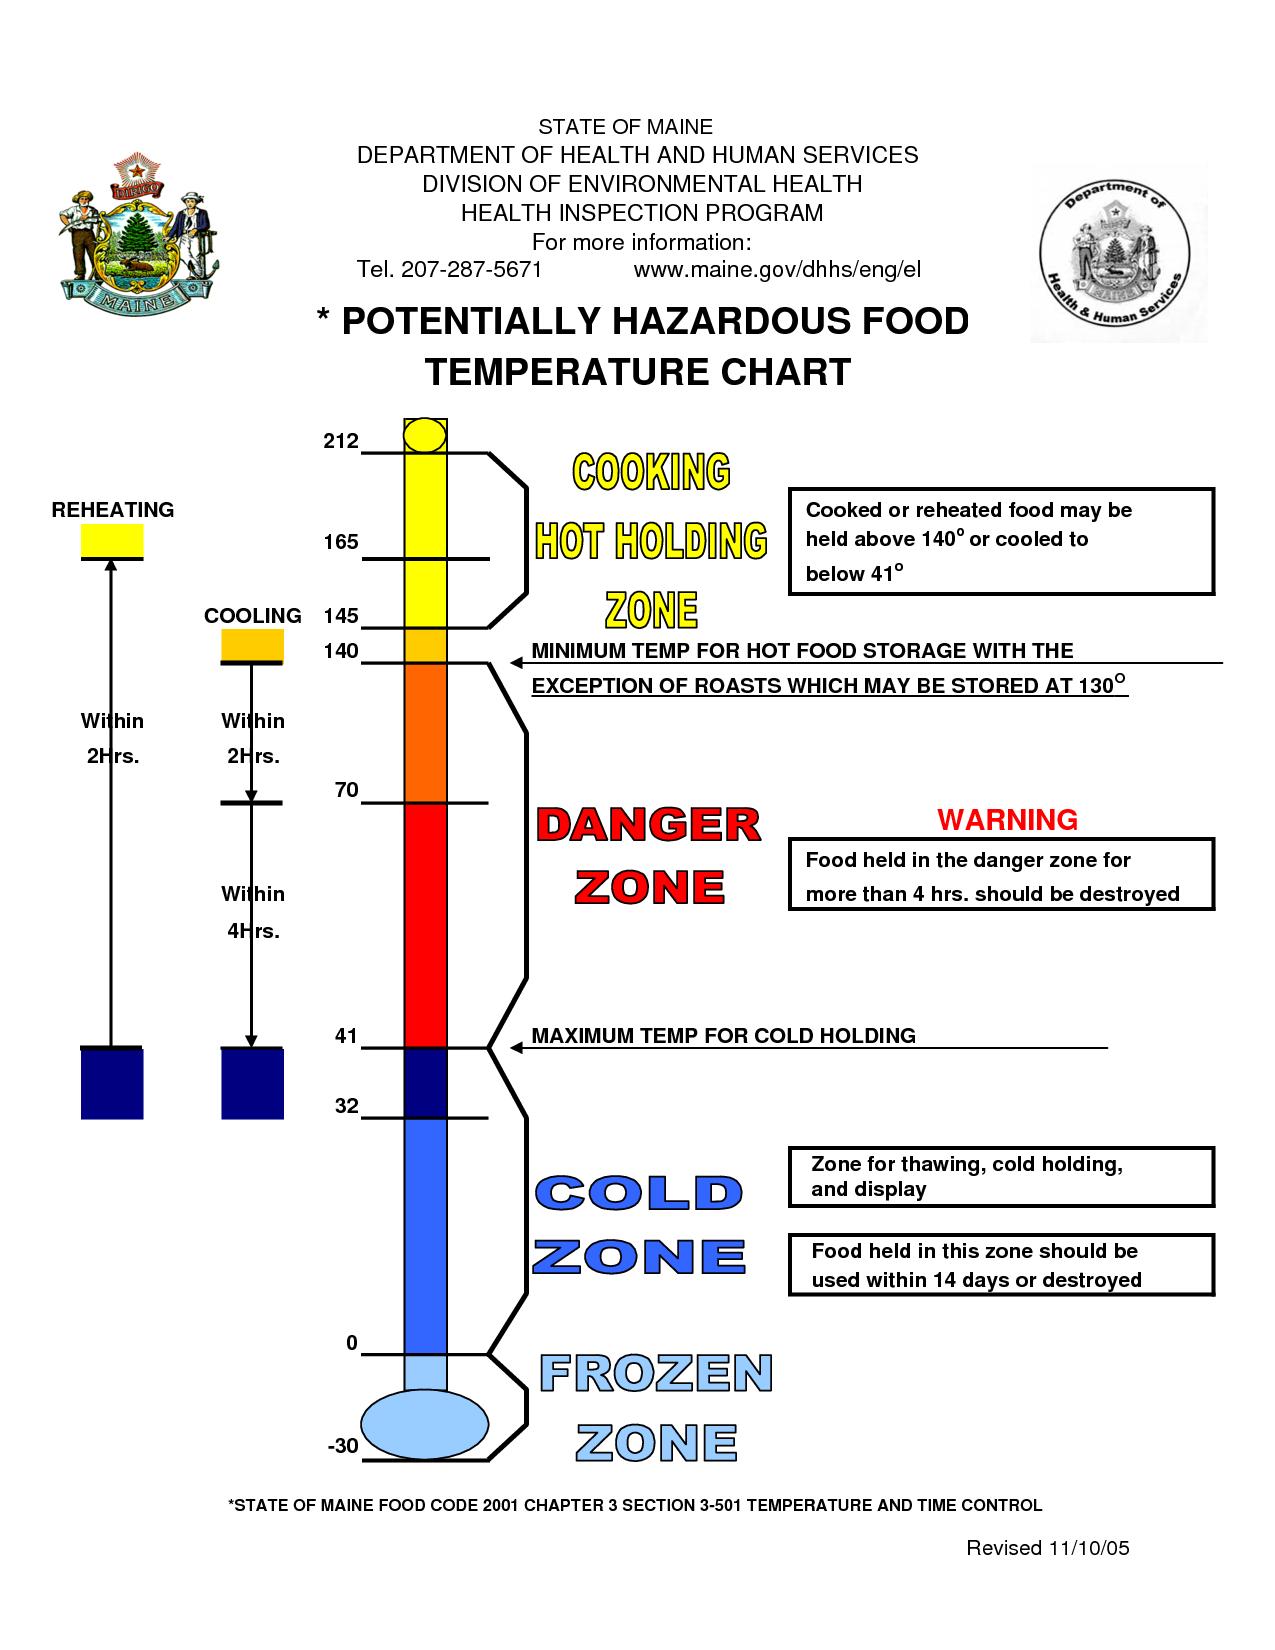 medium resolution of temperature chart template potentially hazardous food temperature humidity diagram food temperature diagram